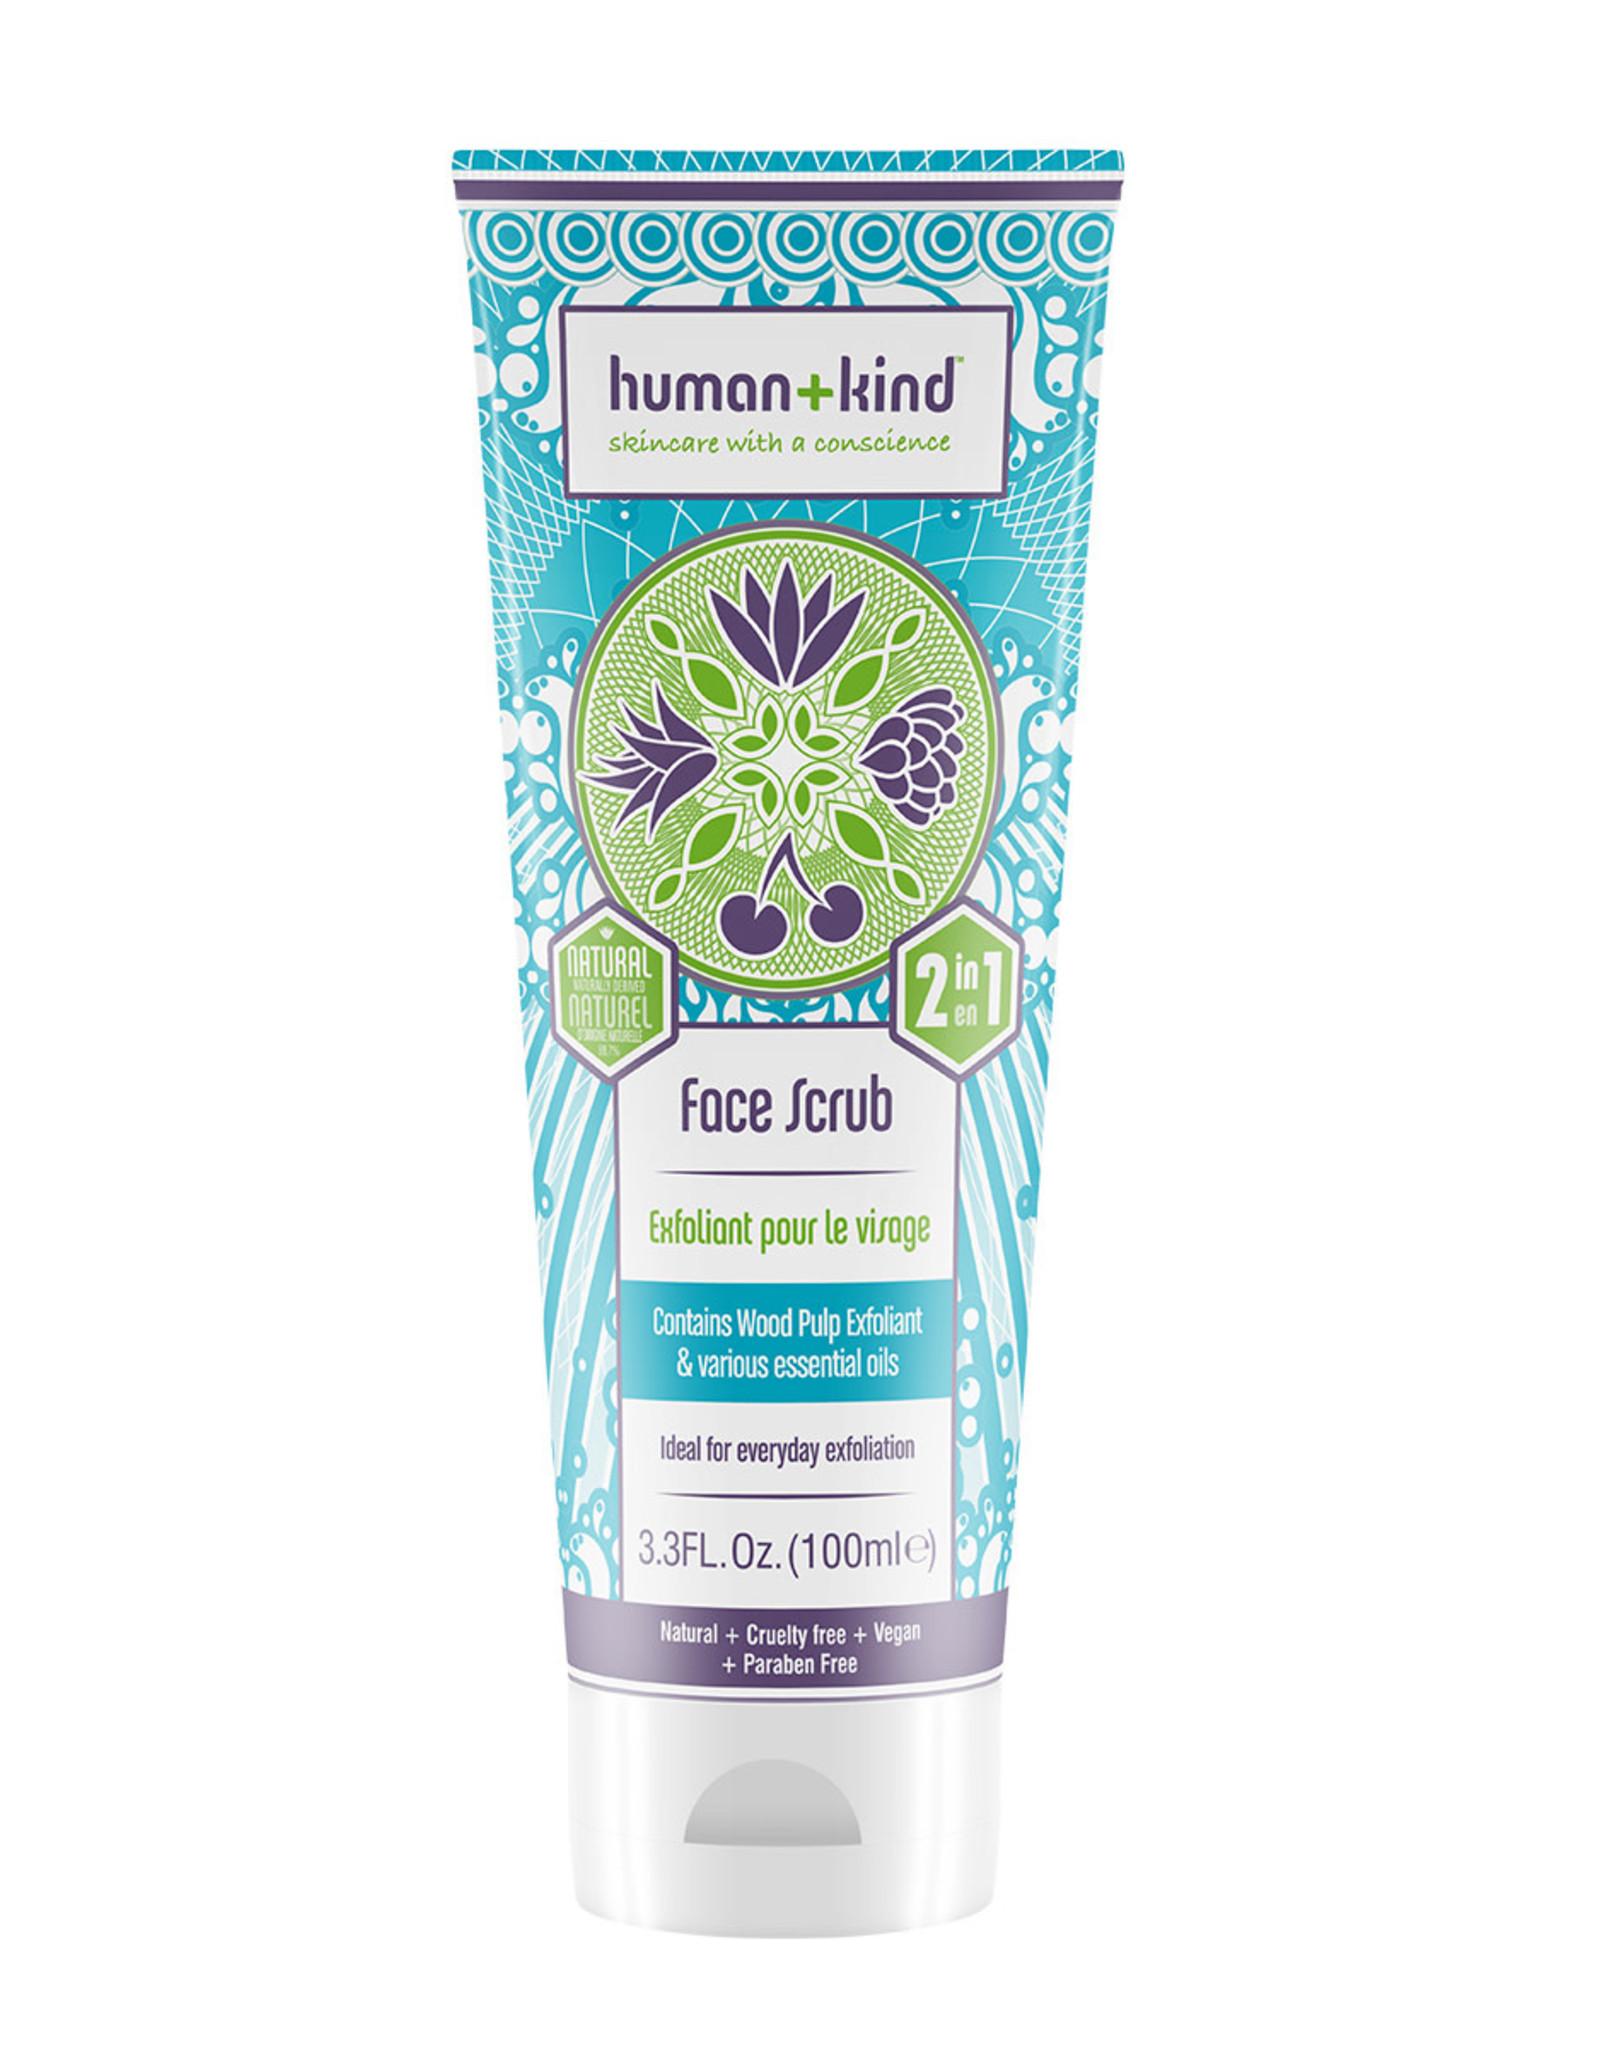 human+kind Face / gezicht scrub vegan 100ml